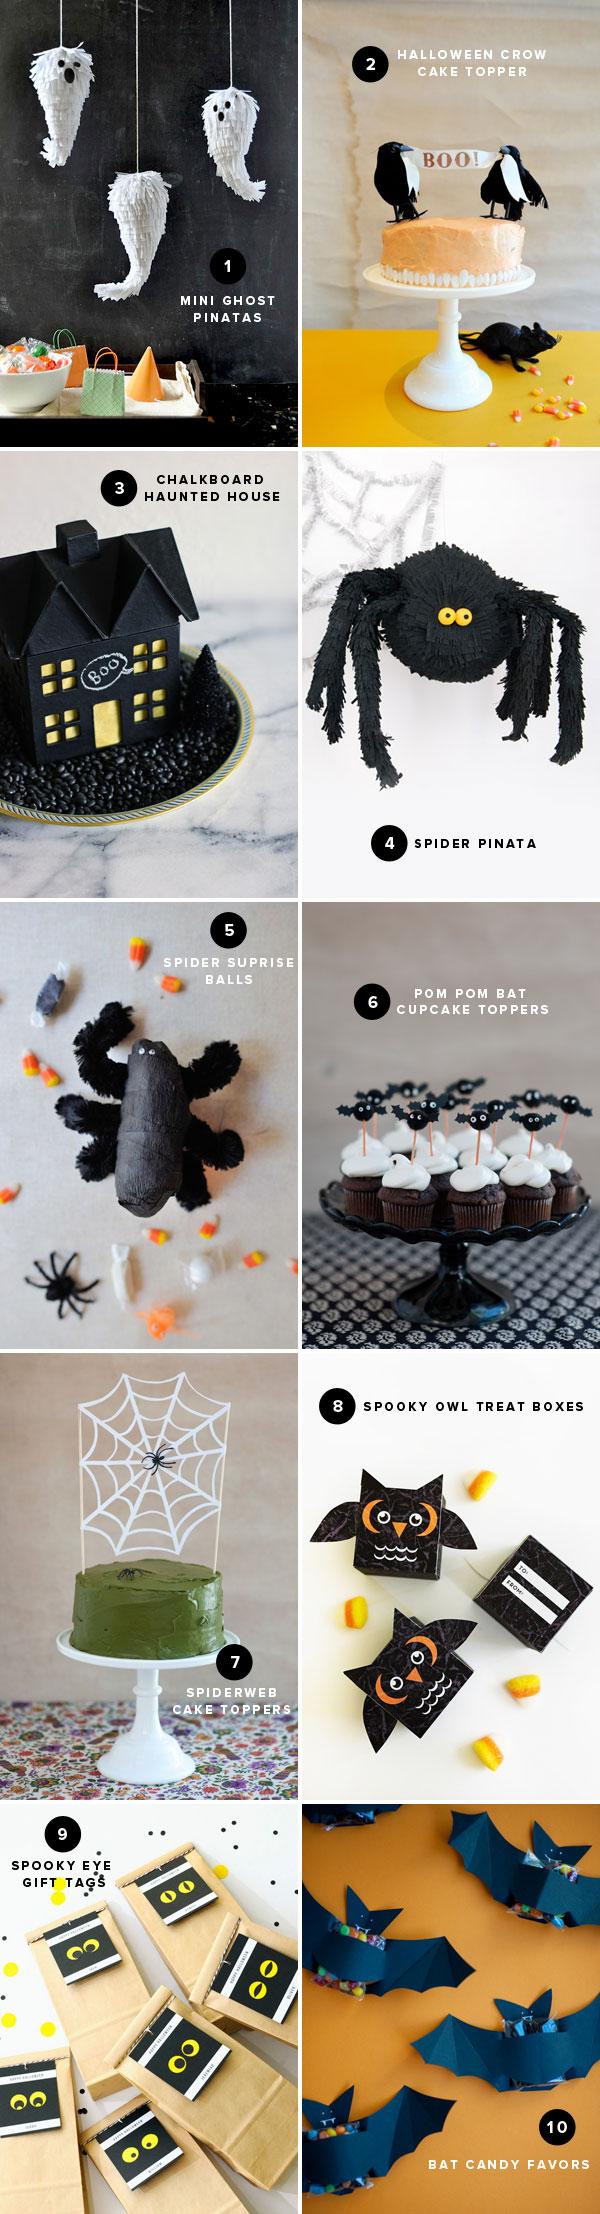 Halloween DIY Ideas | Oh Happy Day!